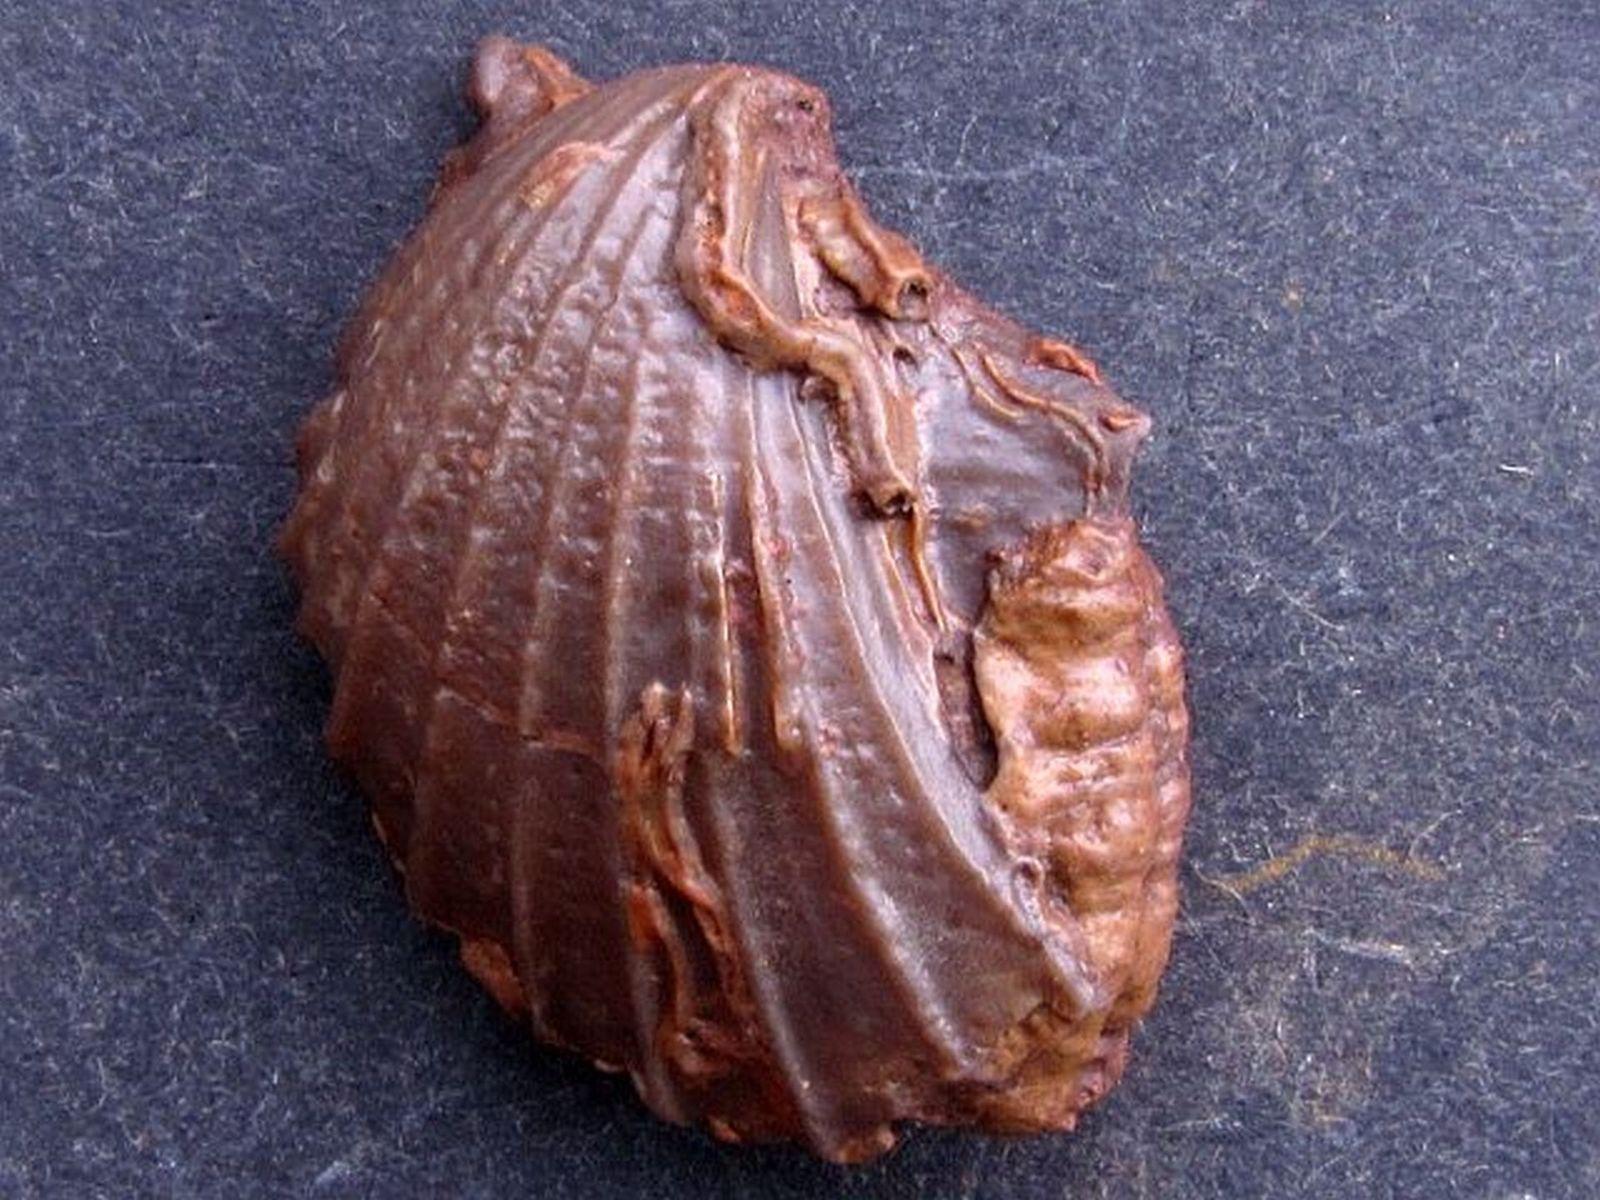 Oxytoma inaequivalvis(Sowerby 1819) with Serpula sulcata (Adams 1797)